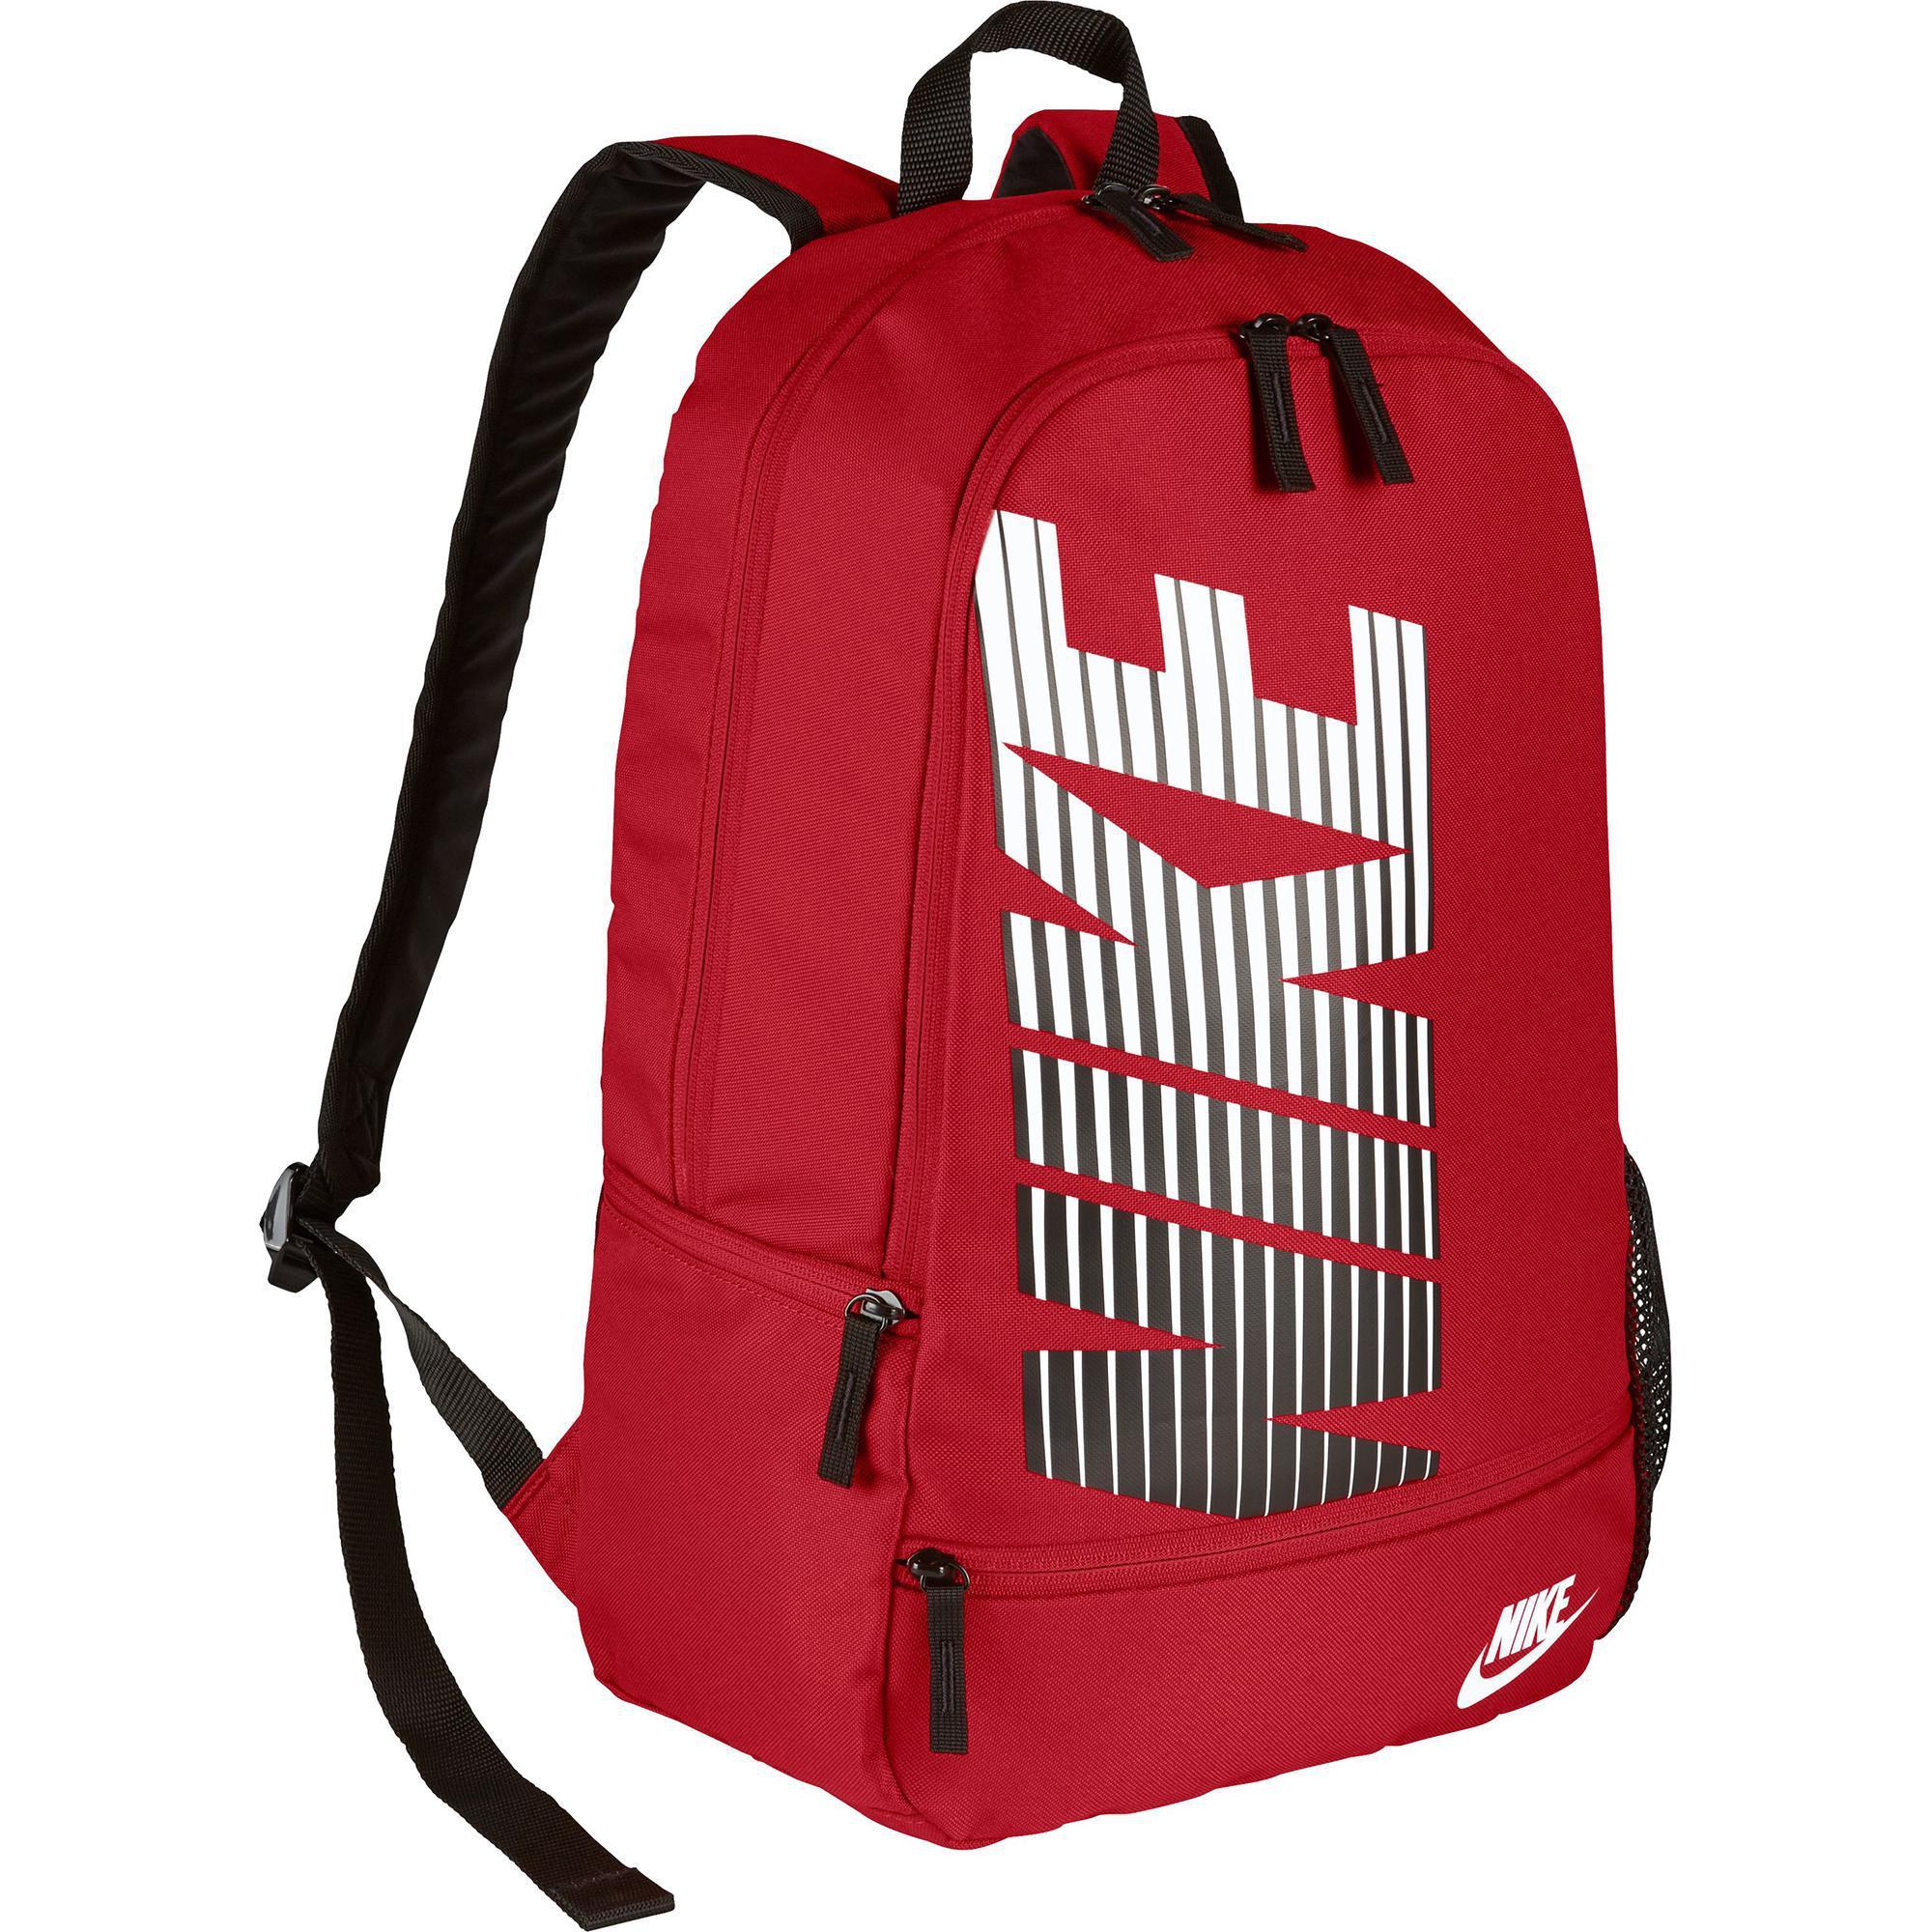 Nike Classic North Backpack - University Red - Tennisnuts.com 5bcfe25bb6300